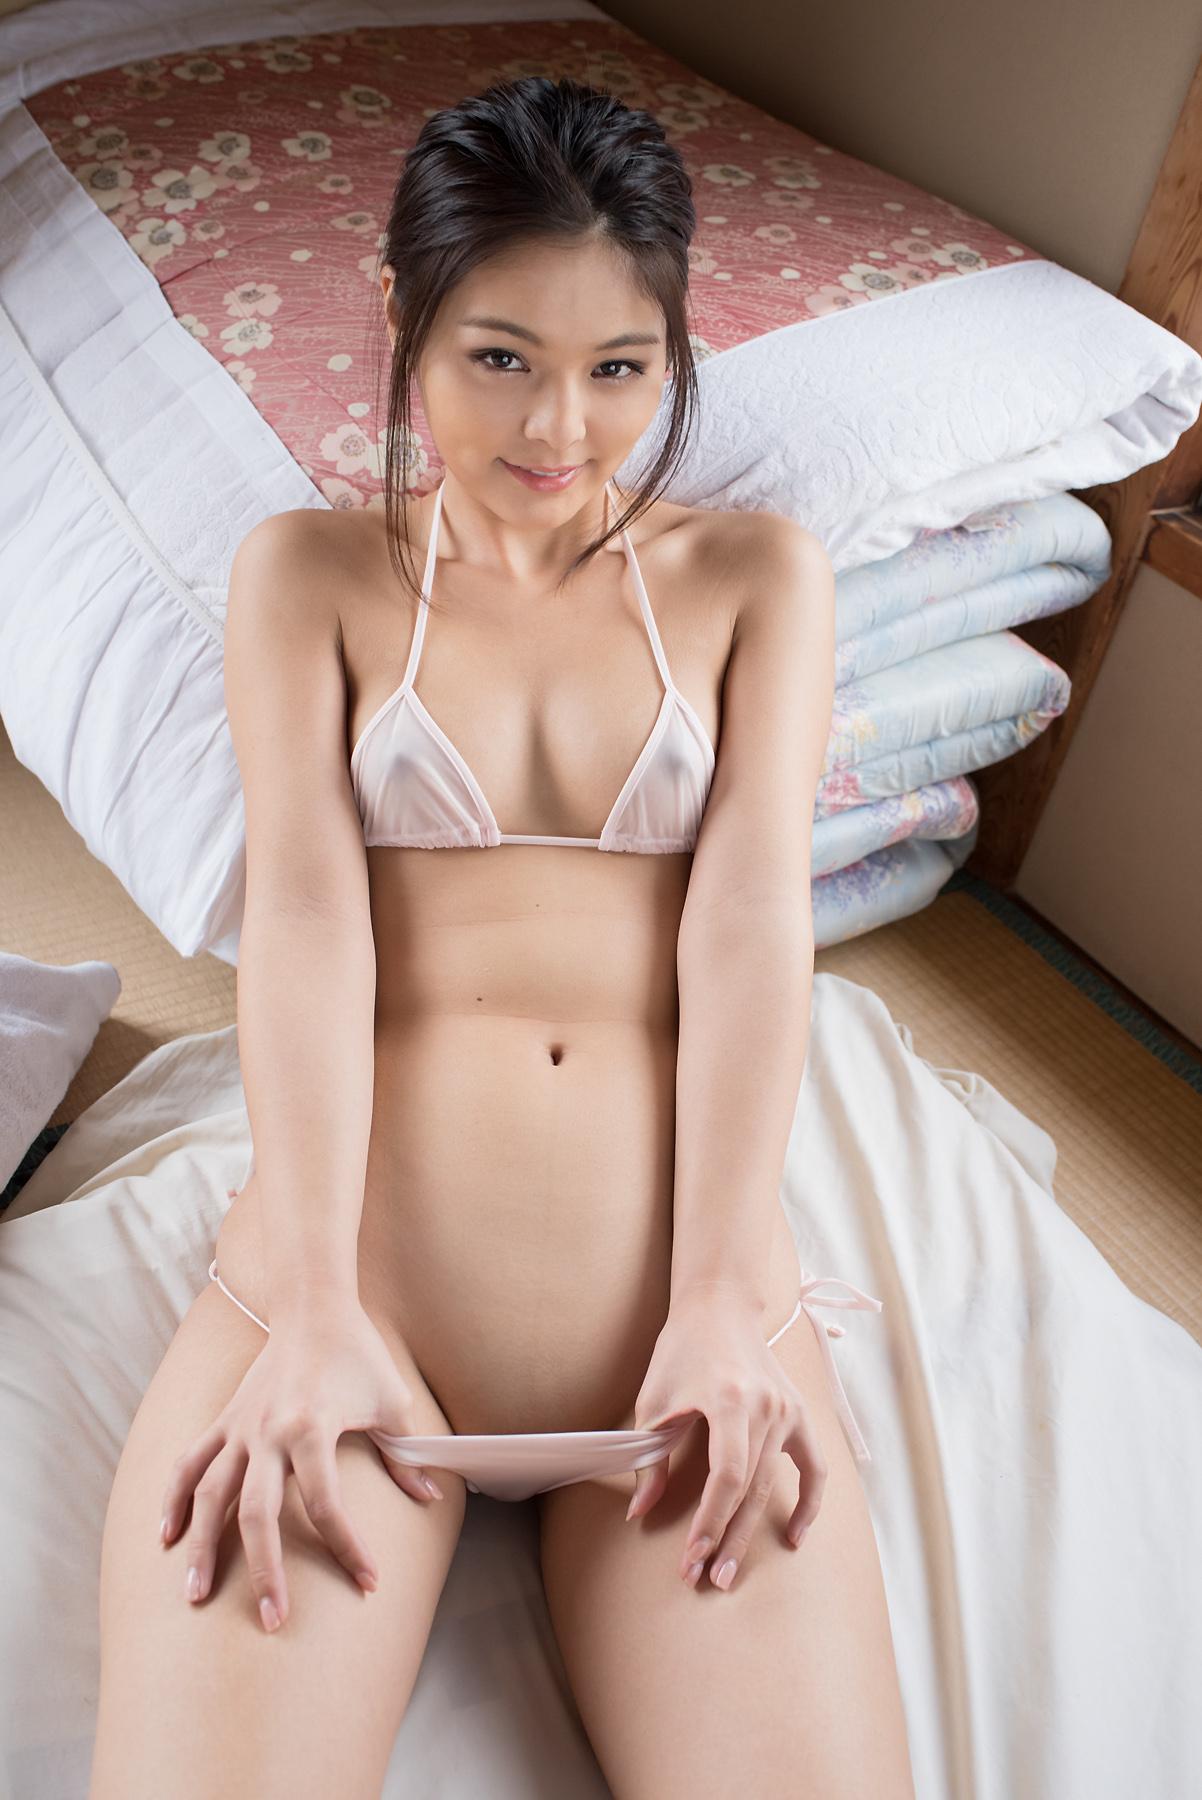 image http://scanlover.com/assets/images/4086-cE9PetJGfjXk9tpx.jpeg